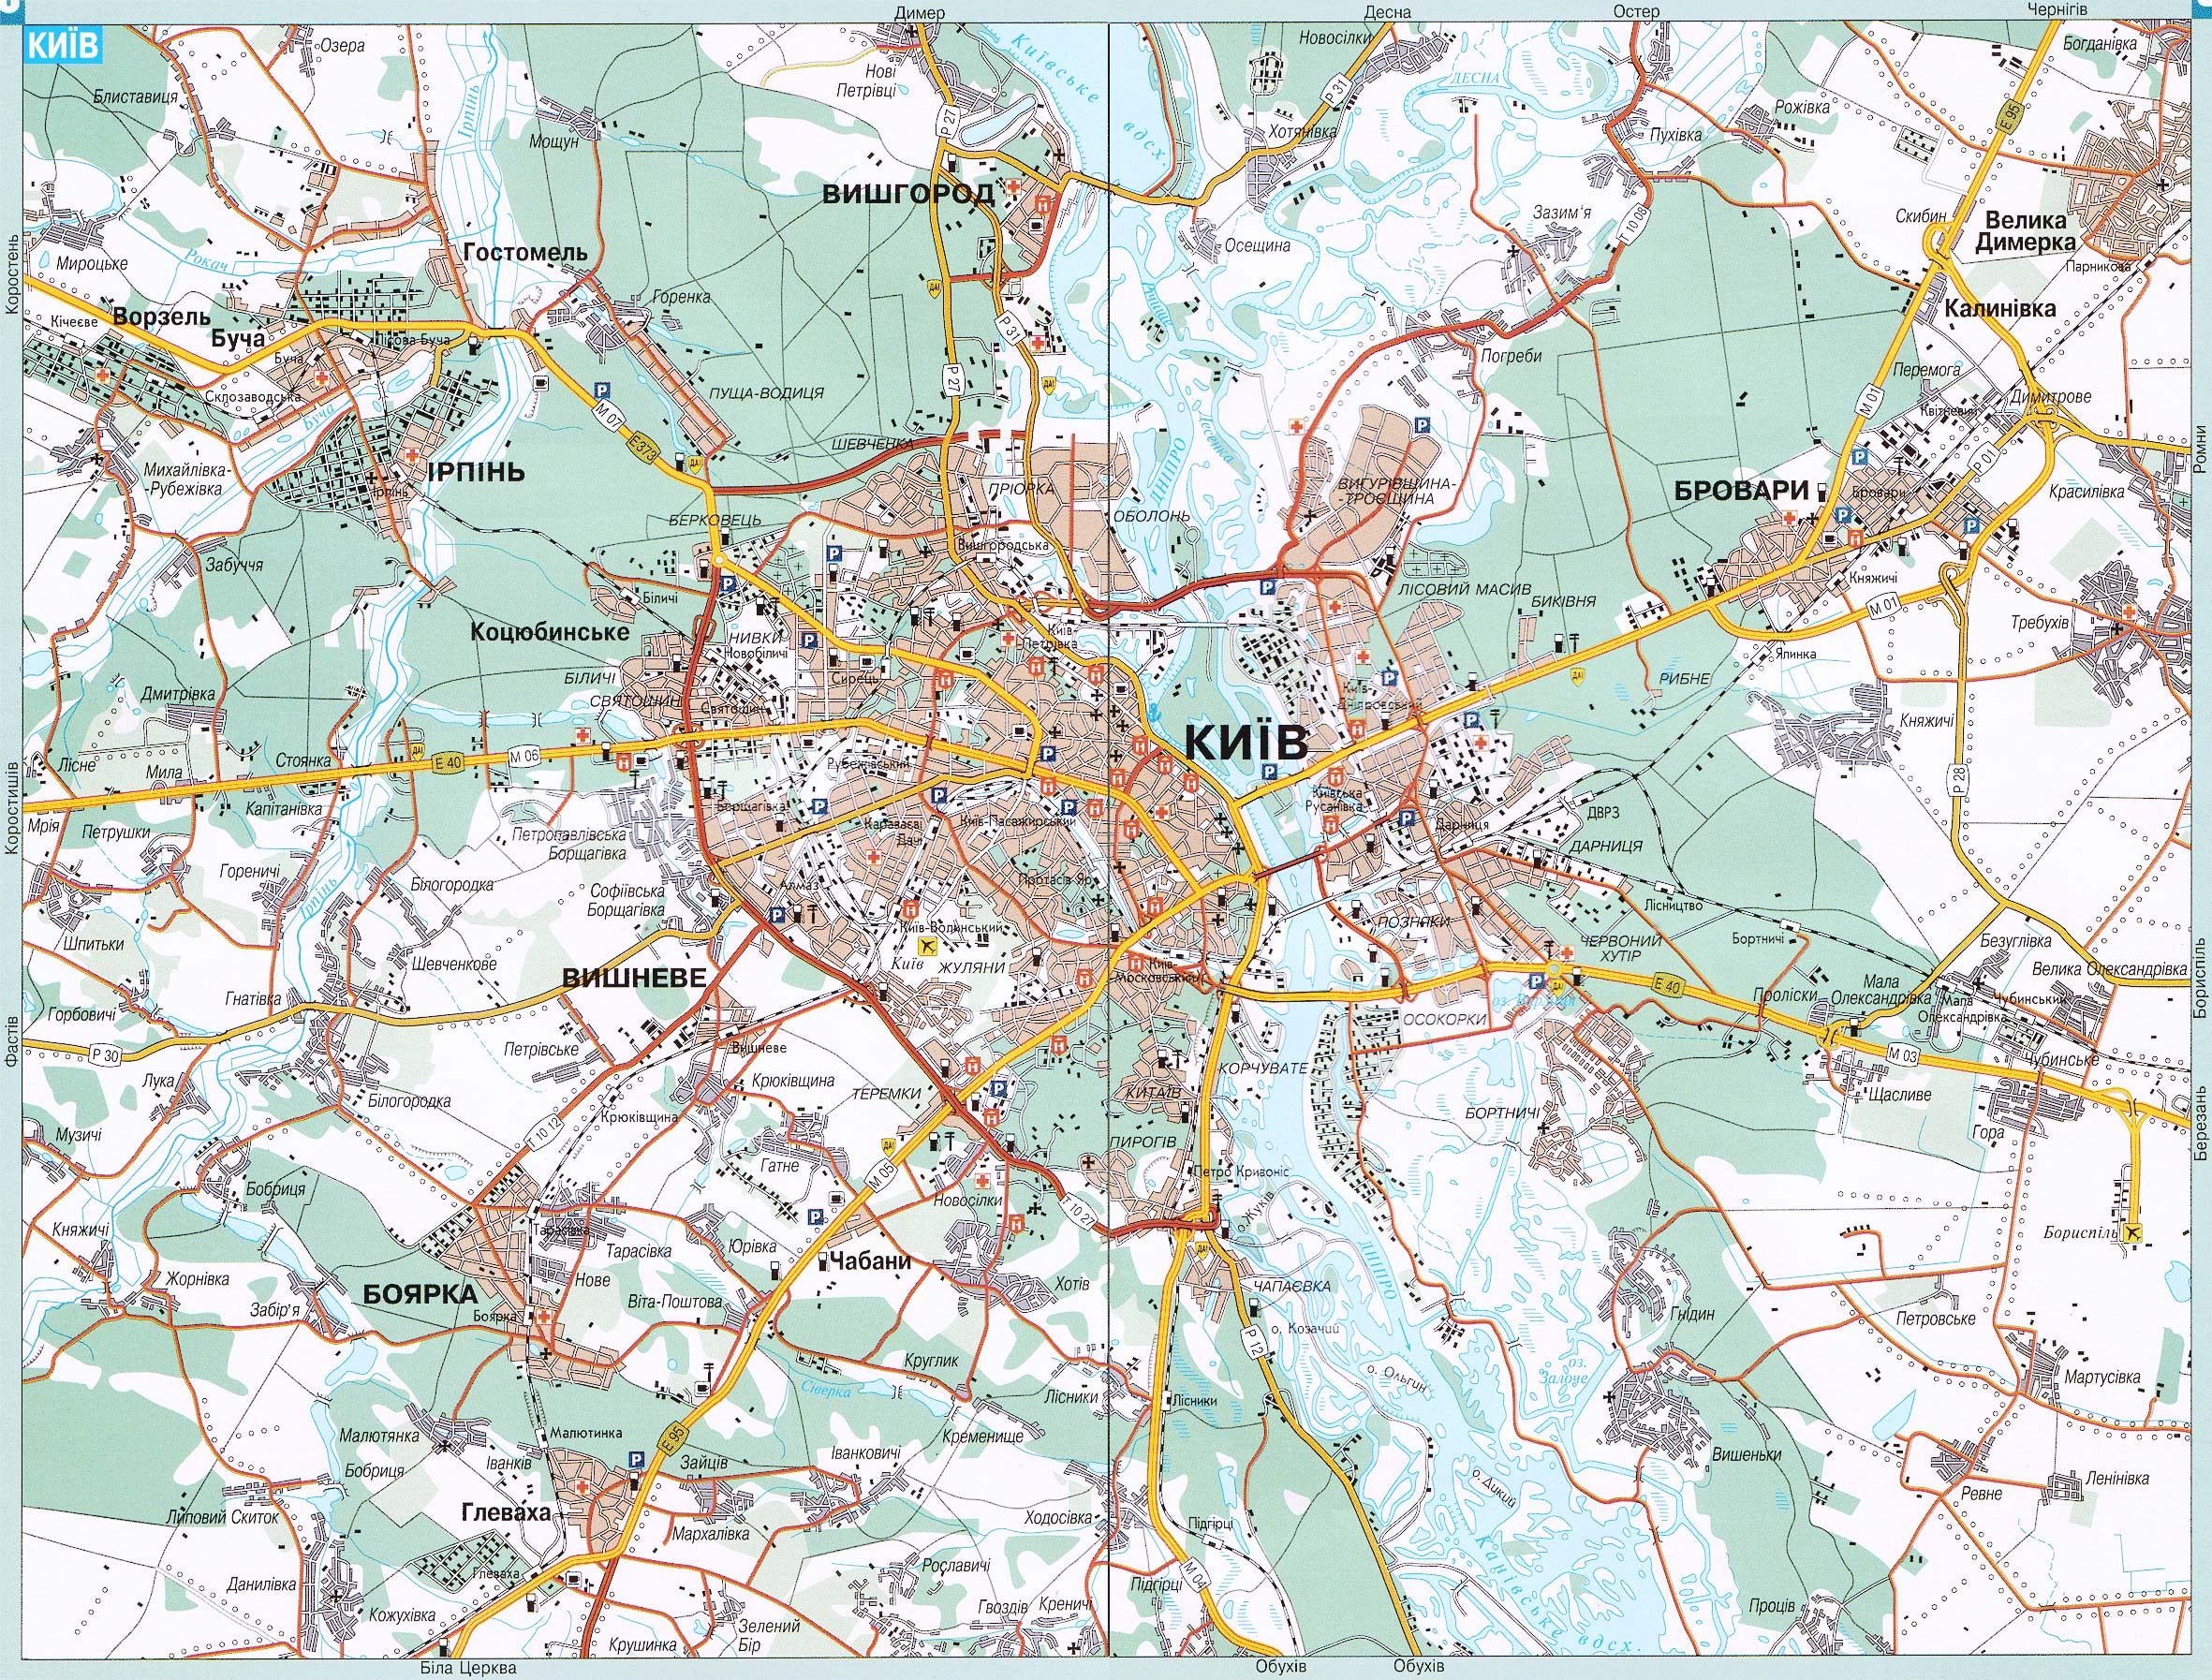 Территорию Киева увеличили на 1,4 тыс. га / Фото: Raster Maps.